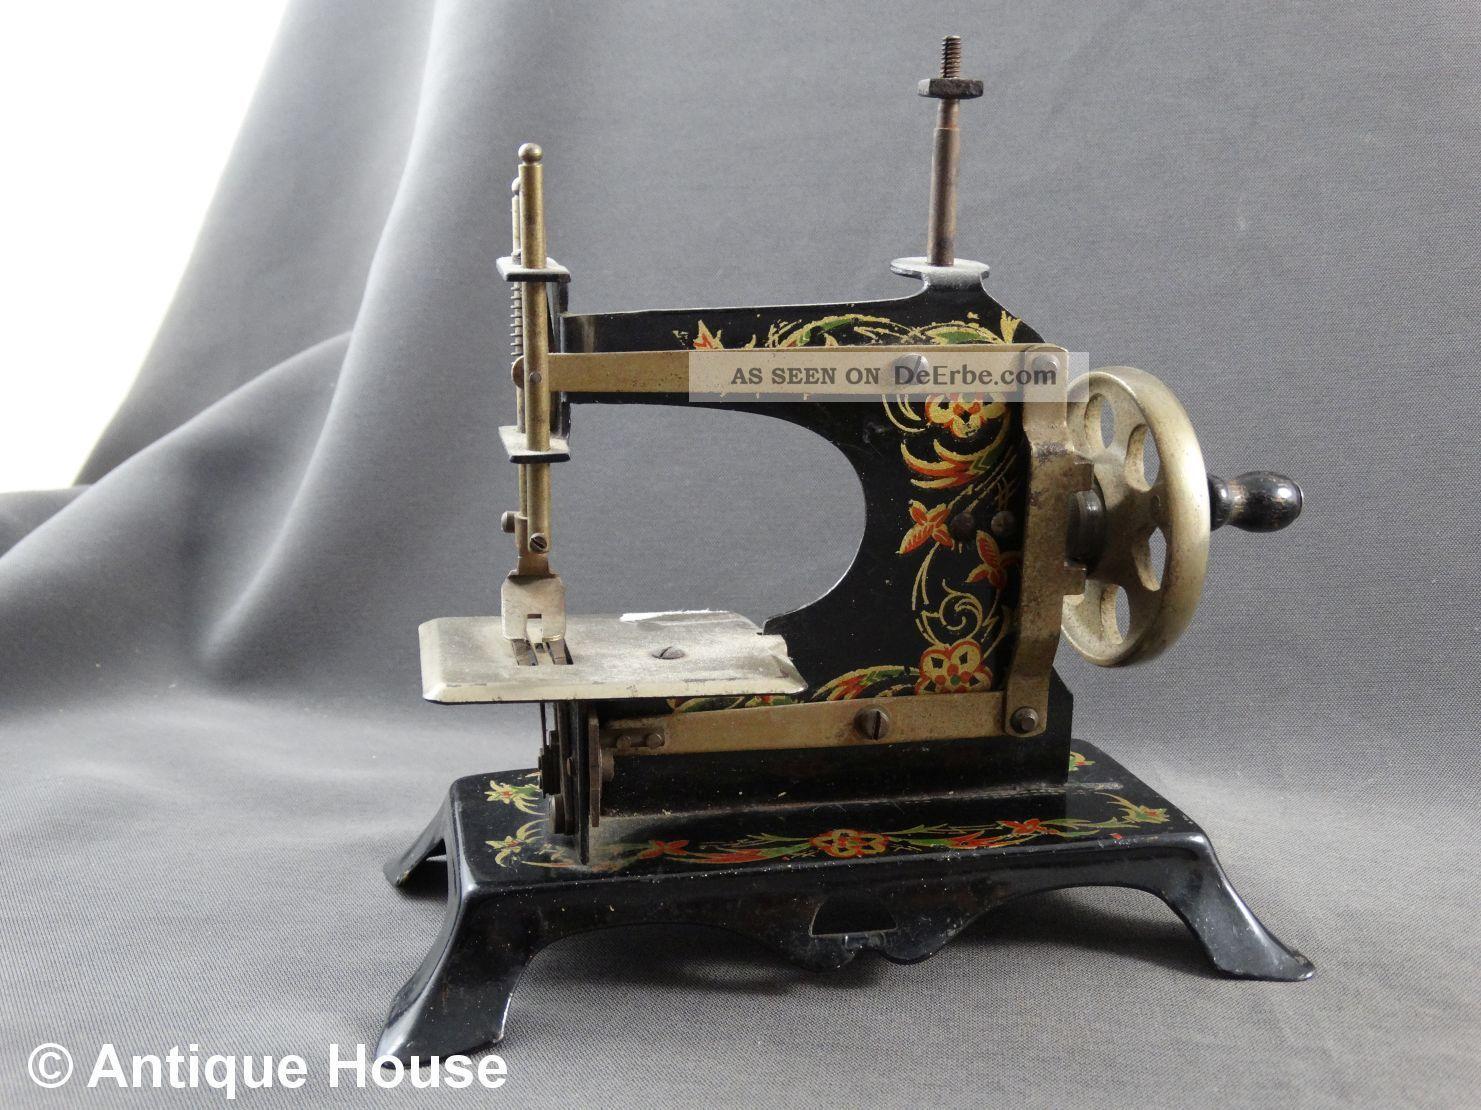 Alte Kindernähmaschine Metall Adler Made In Germany Original, gefertigt vor 1945 Bild